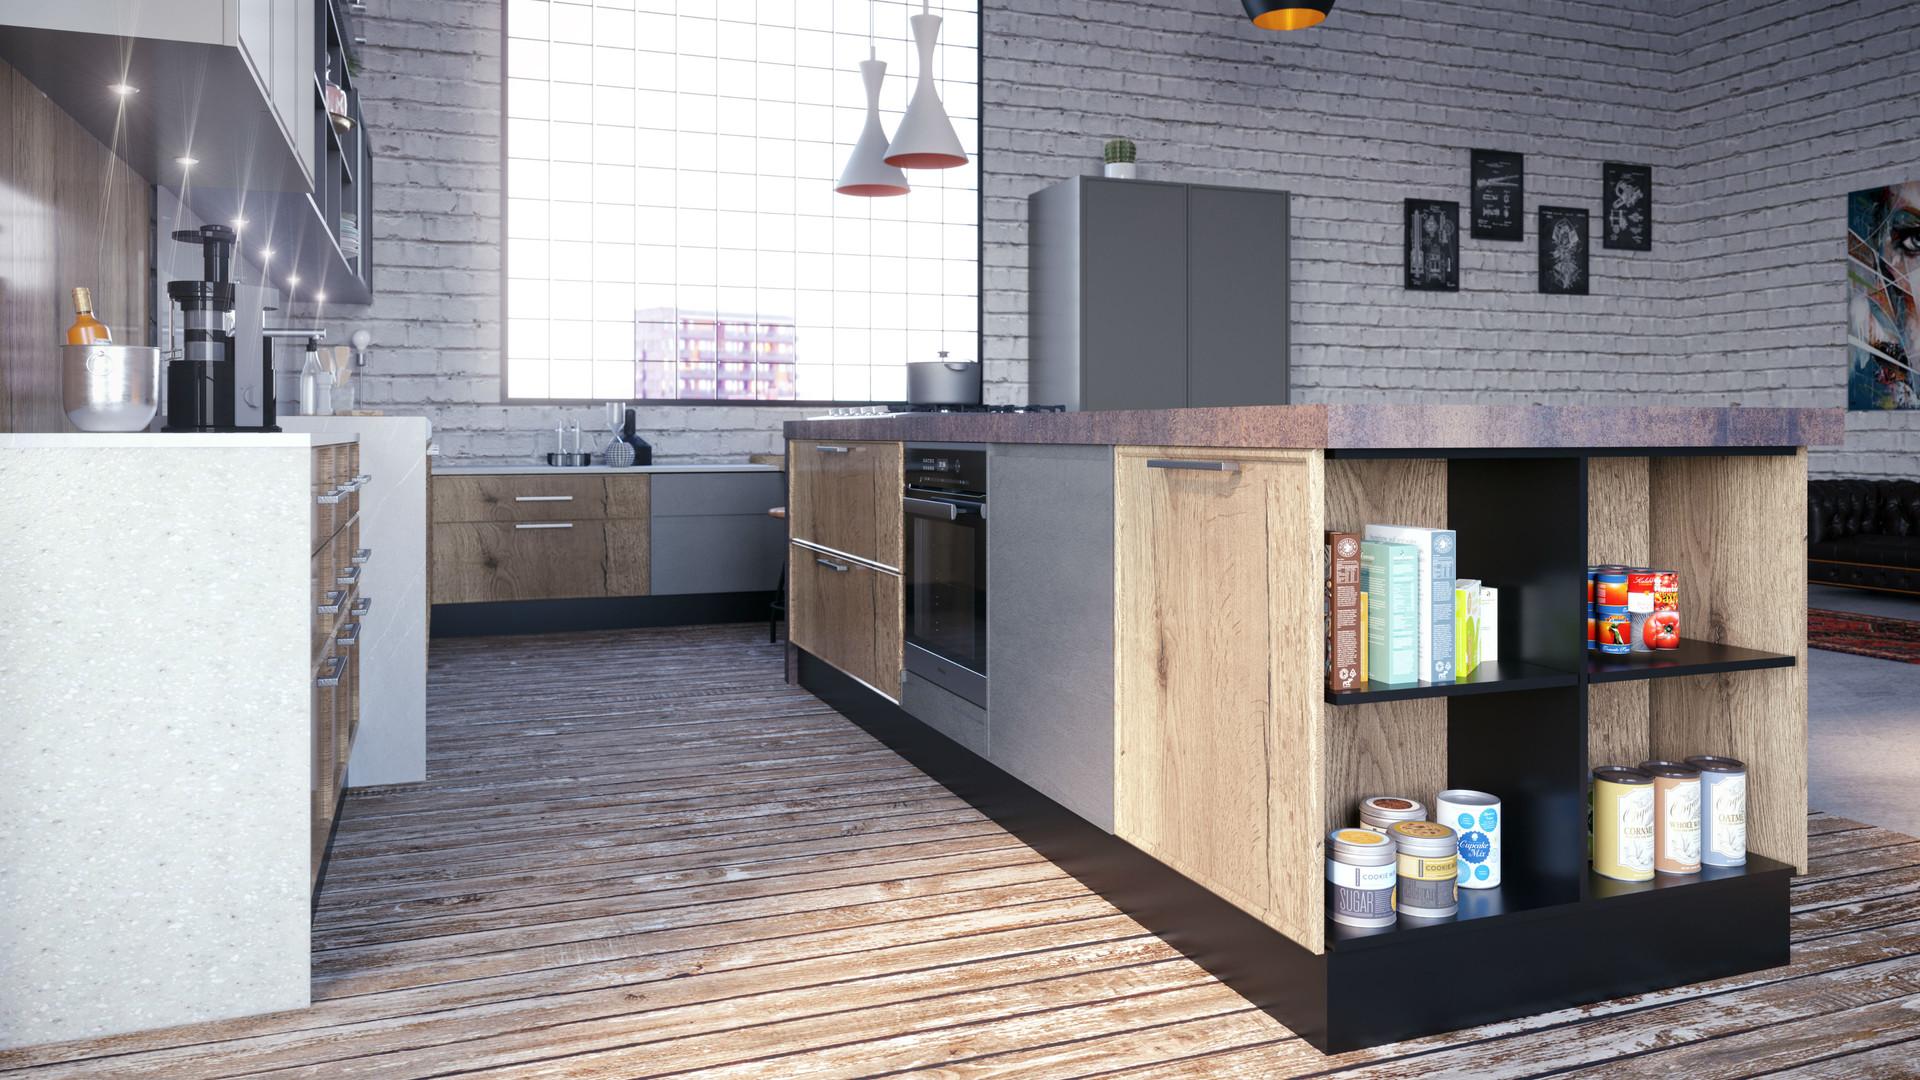 15 -Cocina Trento F87 Nudos + F80 Gris M